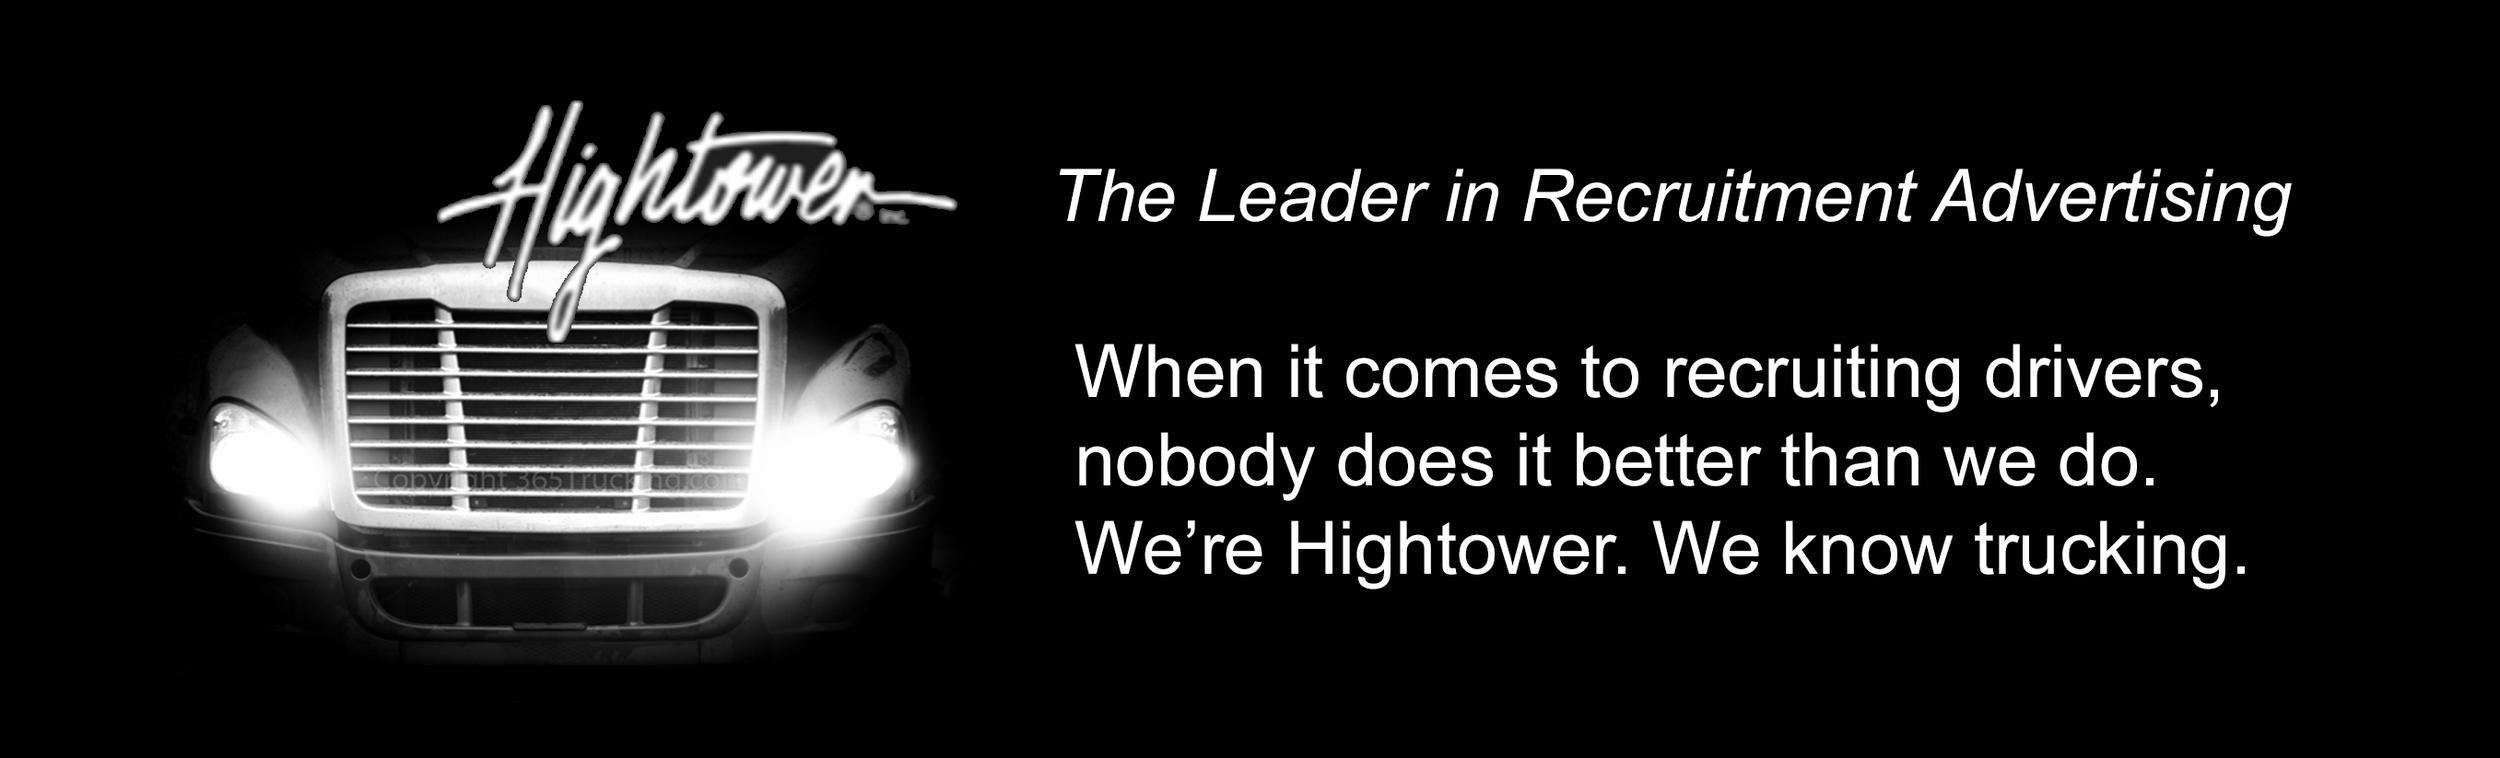 hightower_Banner_no_white_Bar_2.png